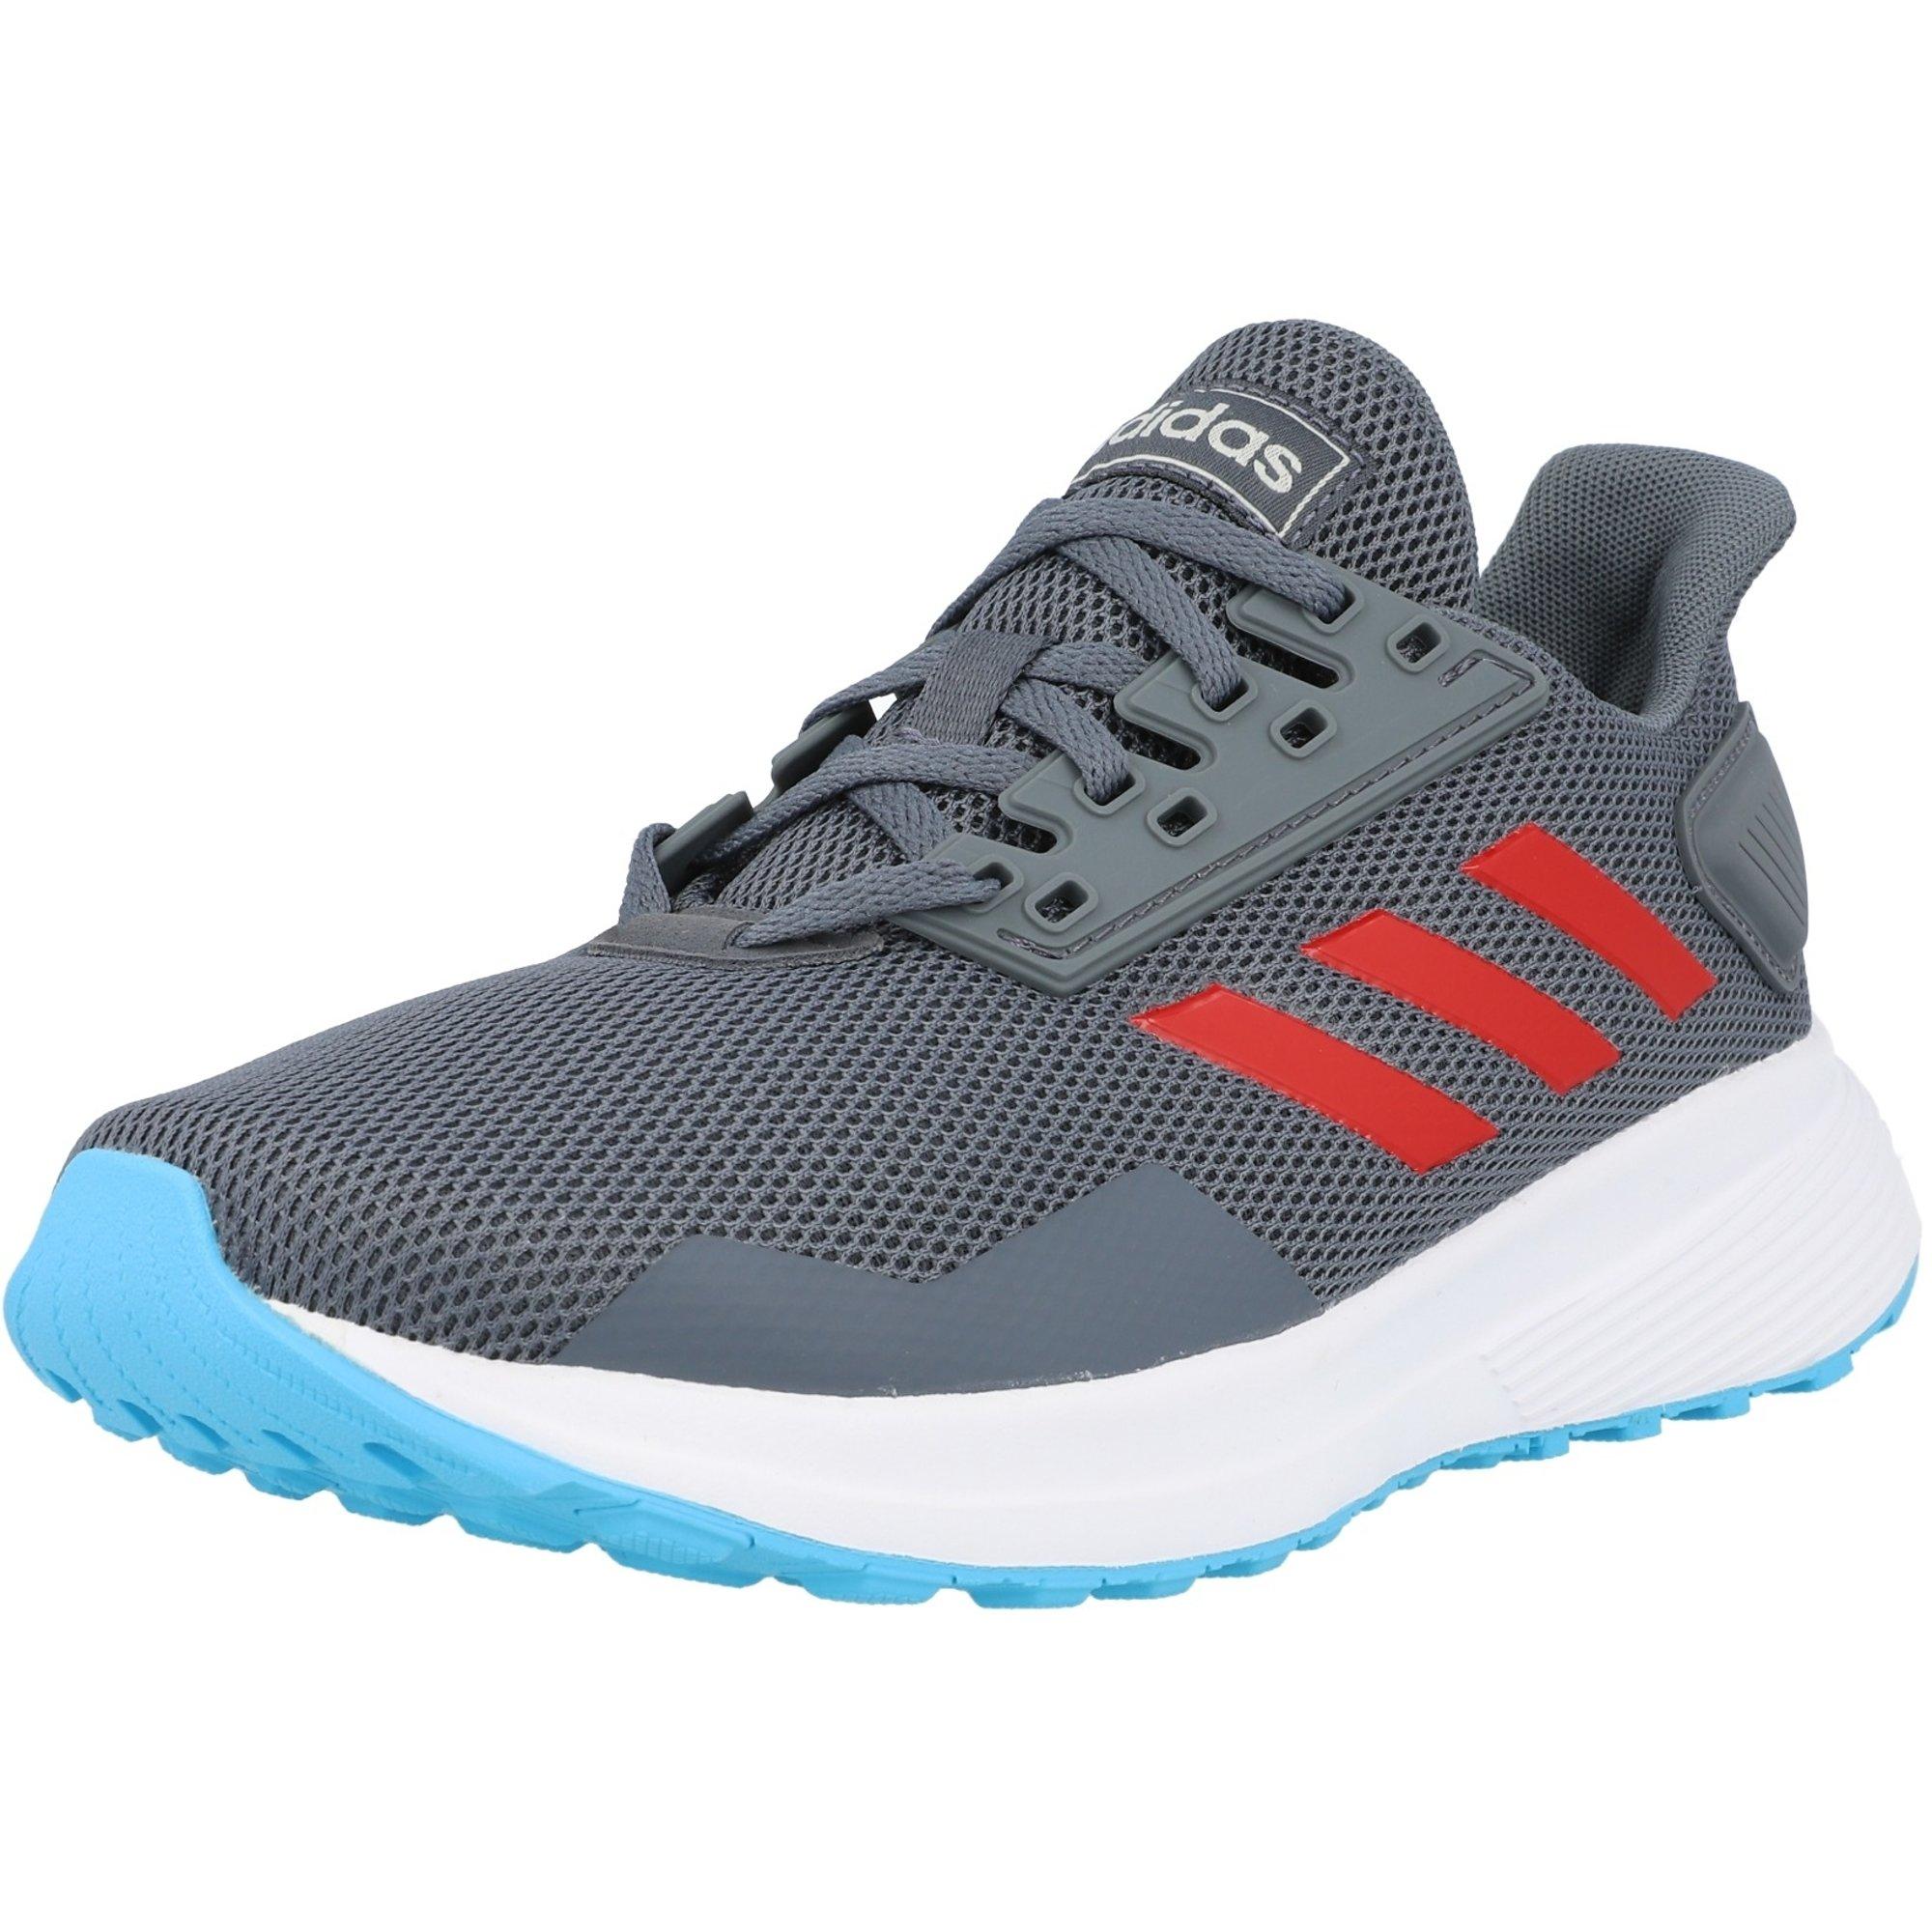 Ordenador portátil ignorar Saga  adidas Duramo 9 K Onix/Scarlet Mesh - Trainers Shoes - Awesome Shoes